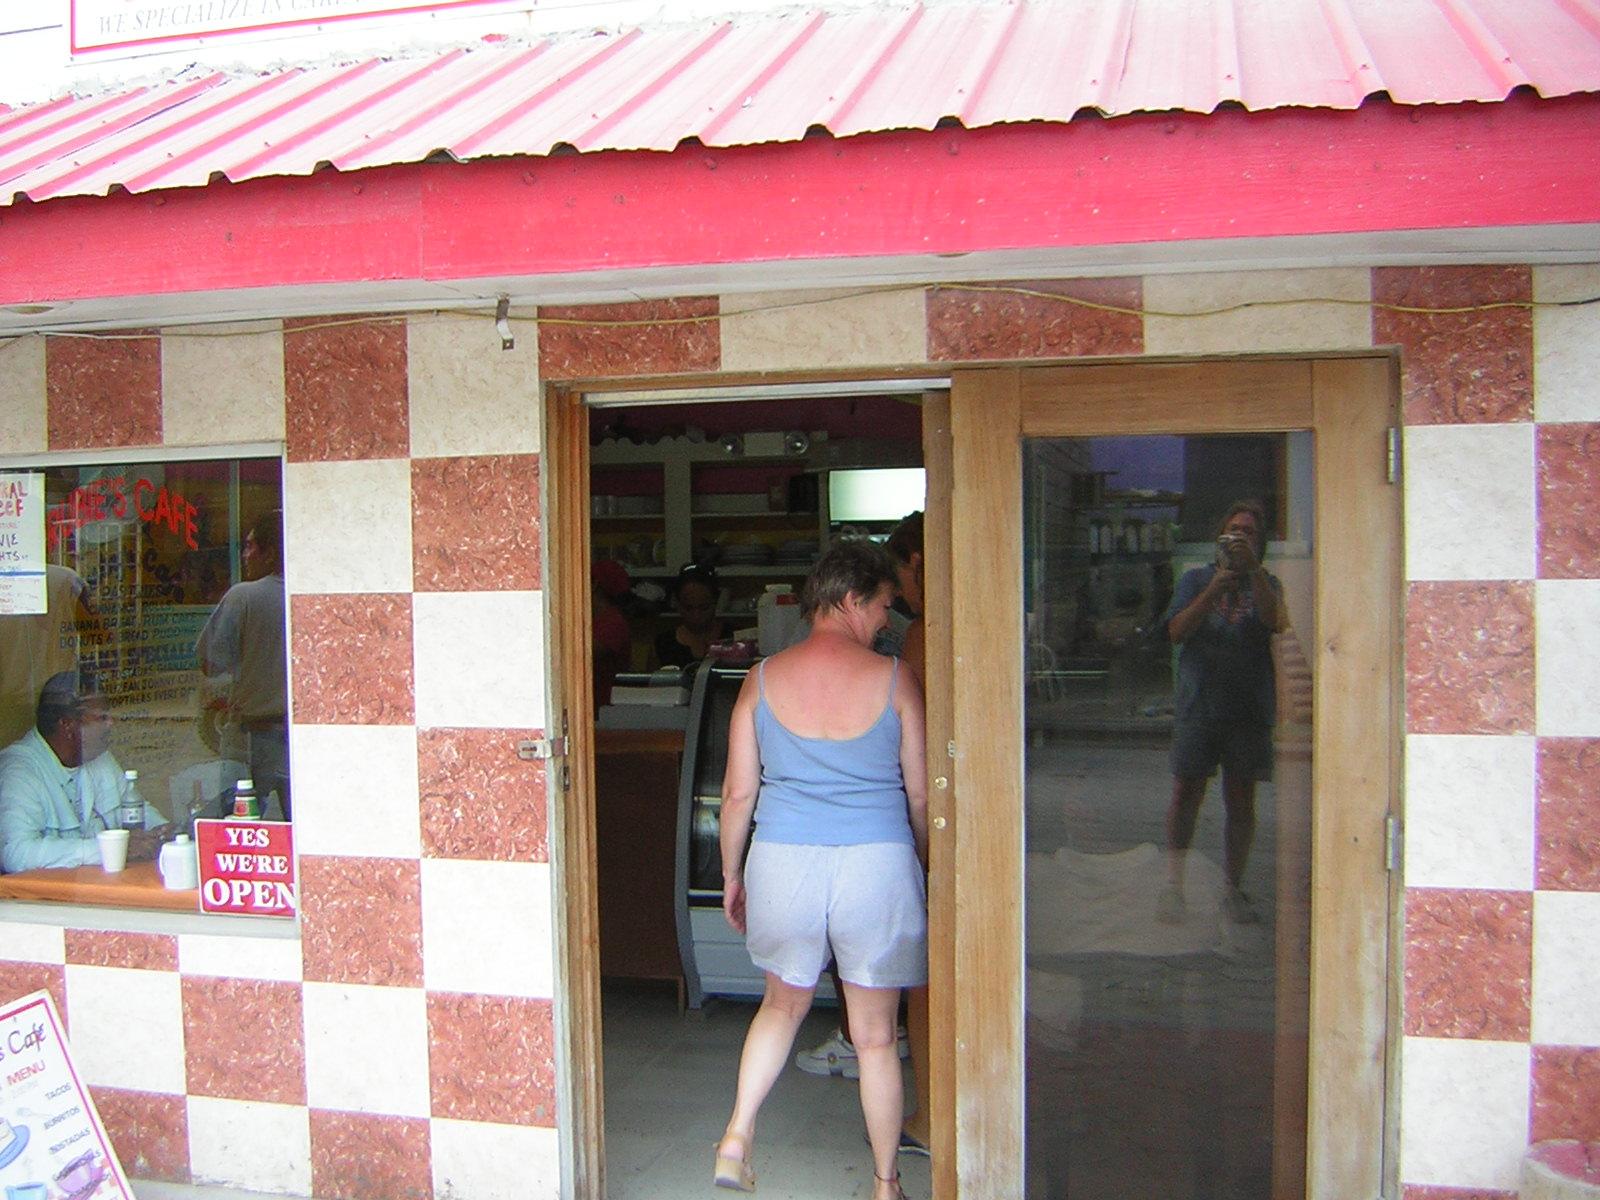 [Dianna+Entering+Ruby's+Cafe+6-26-2007+5-48-29+AM.JPG]